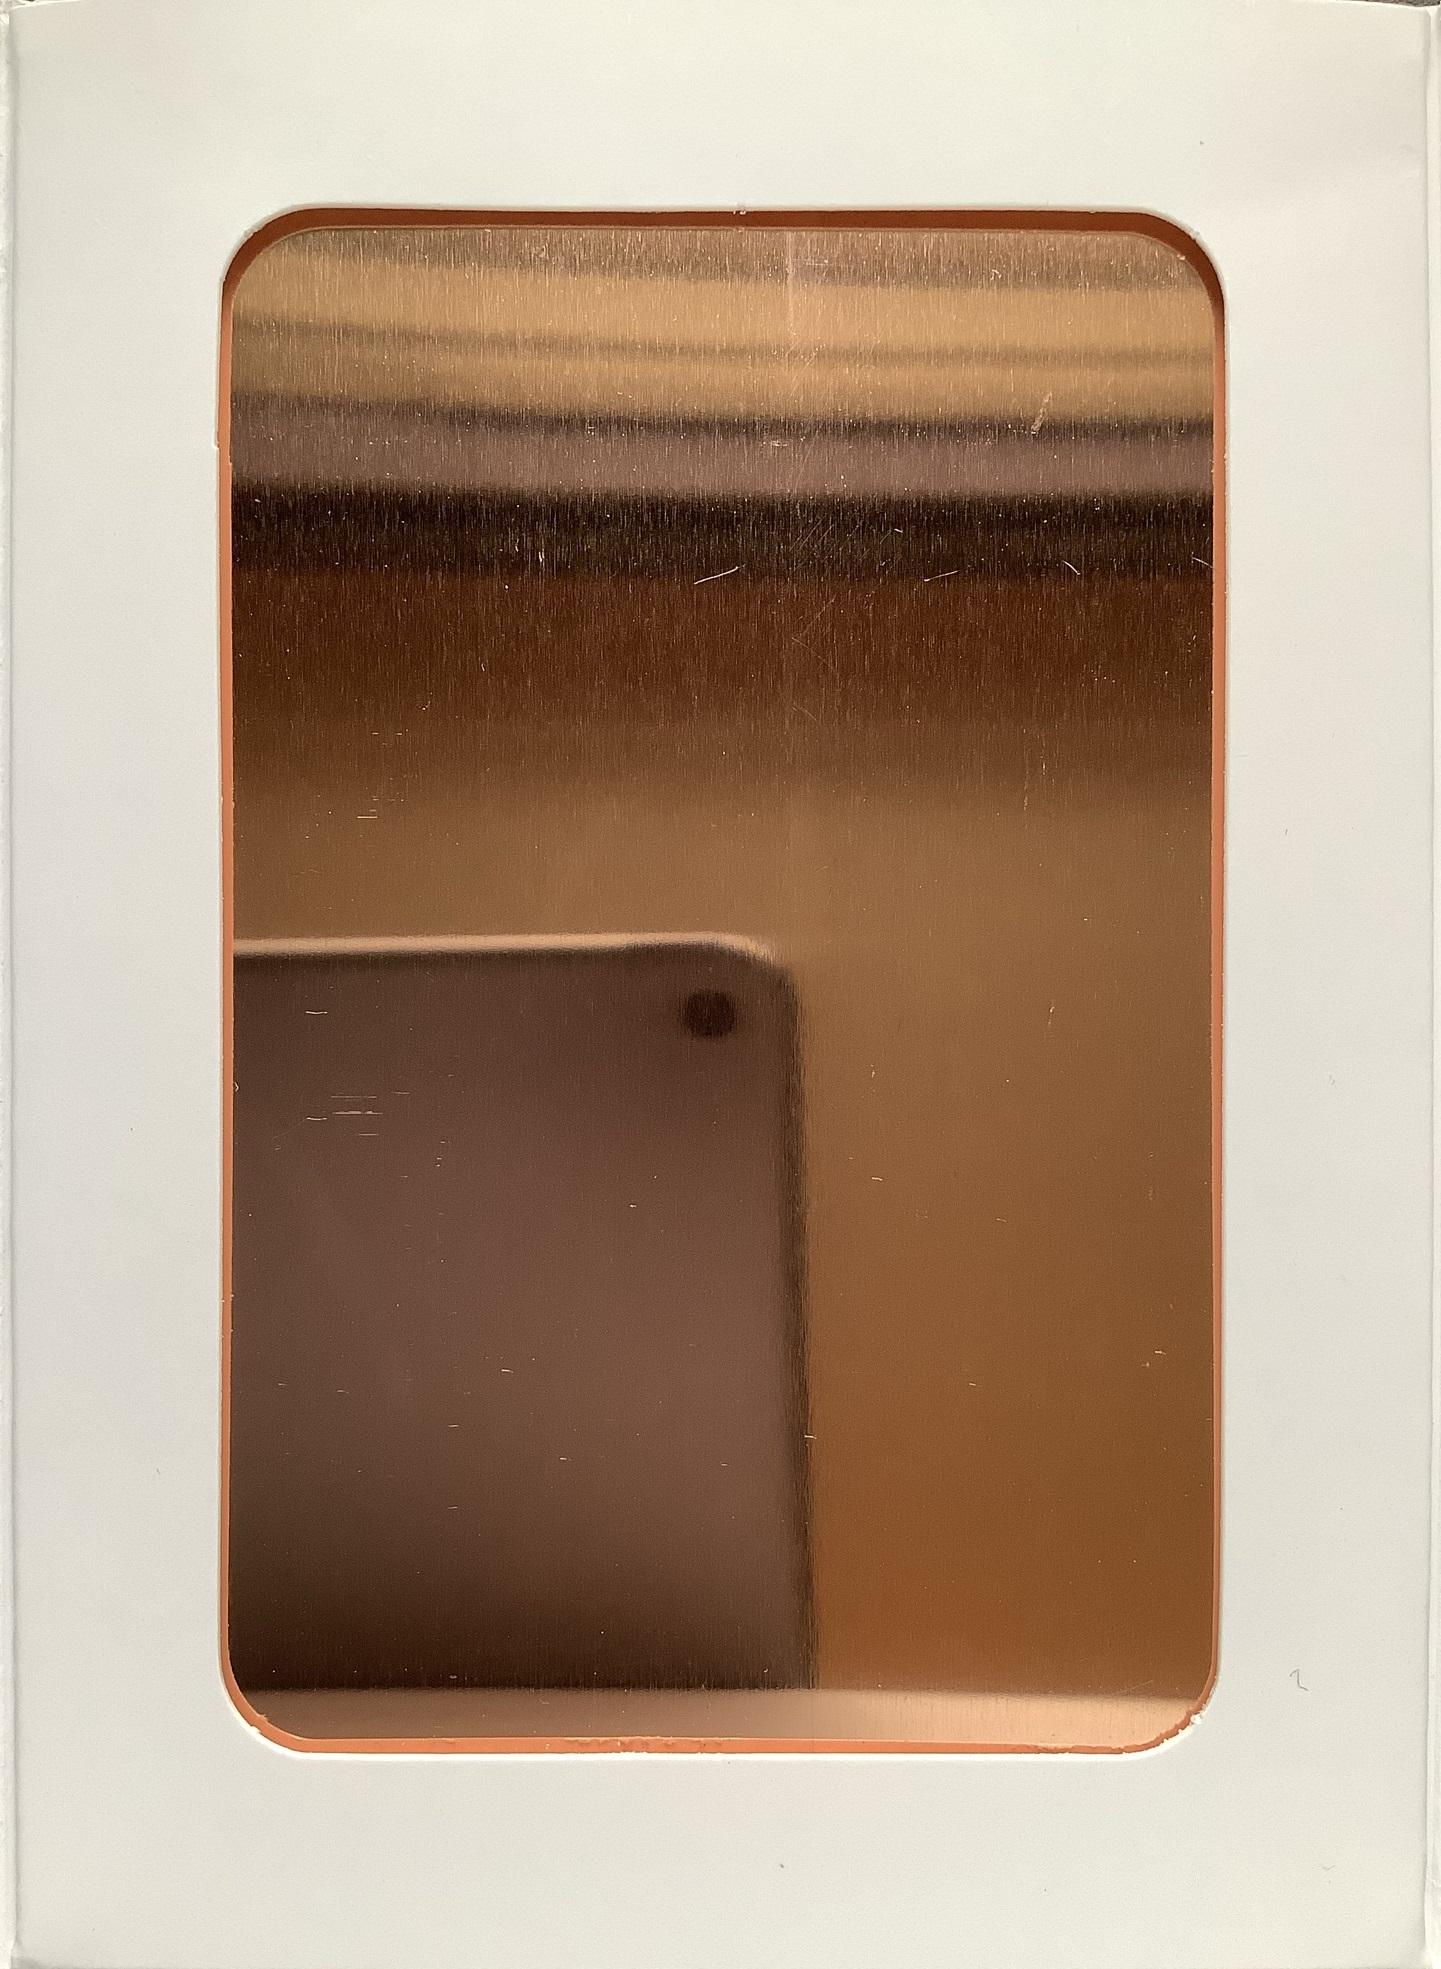 Aurubis Copper – Nordic Standard